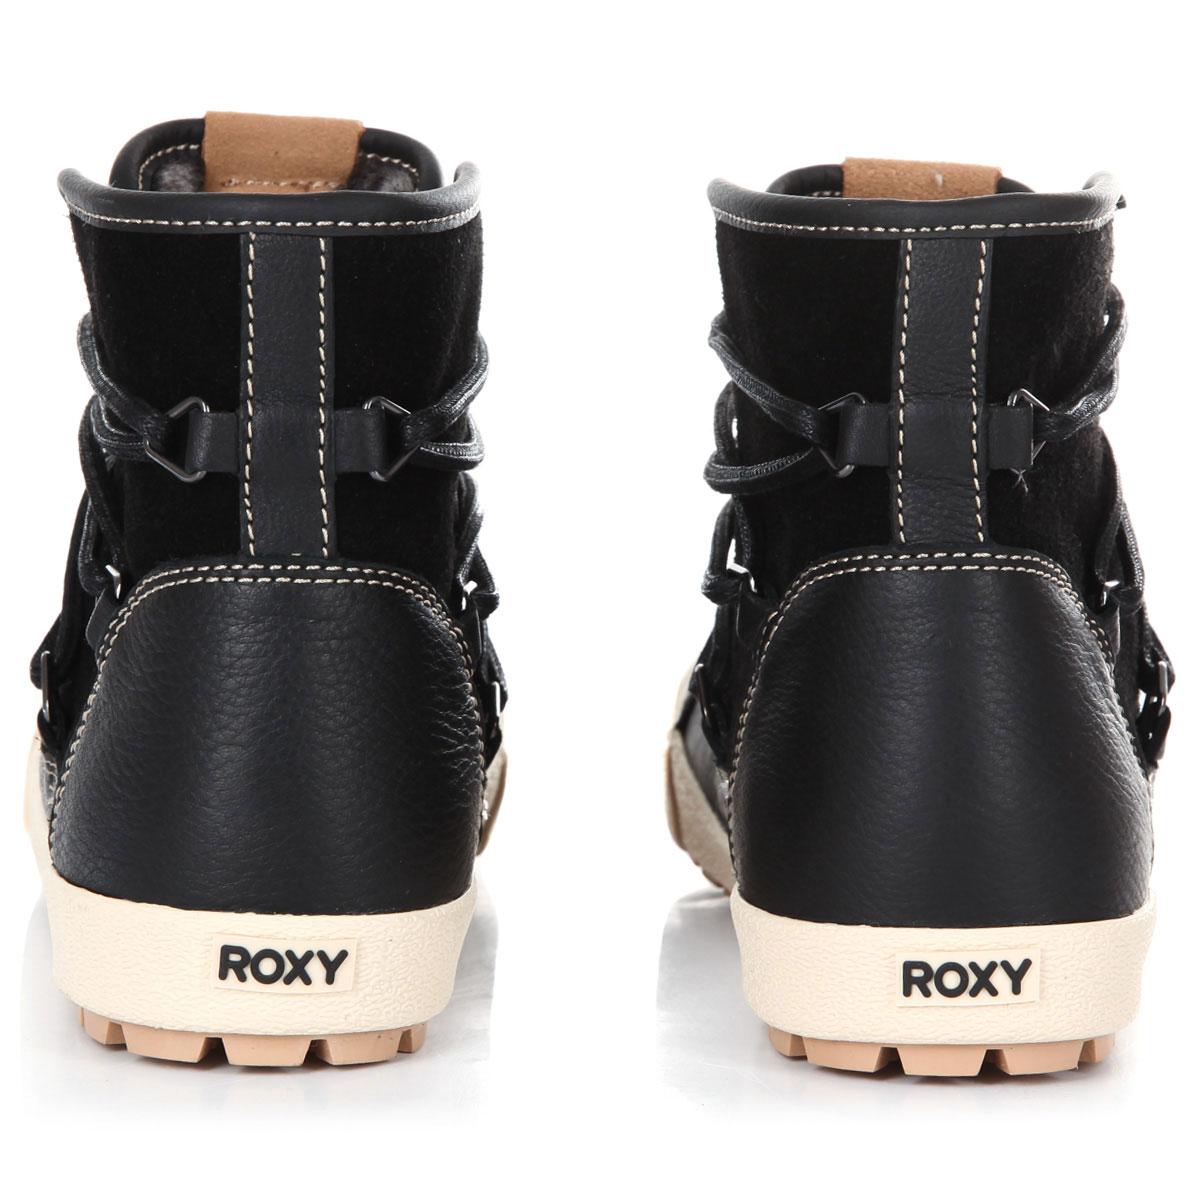 232607cbe41f Купить ботинки зимние женские Roxy Darwin Boot Black (ARJB300017-BL0) в  интернет-магазине Proskater.ru